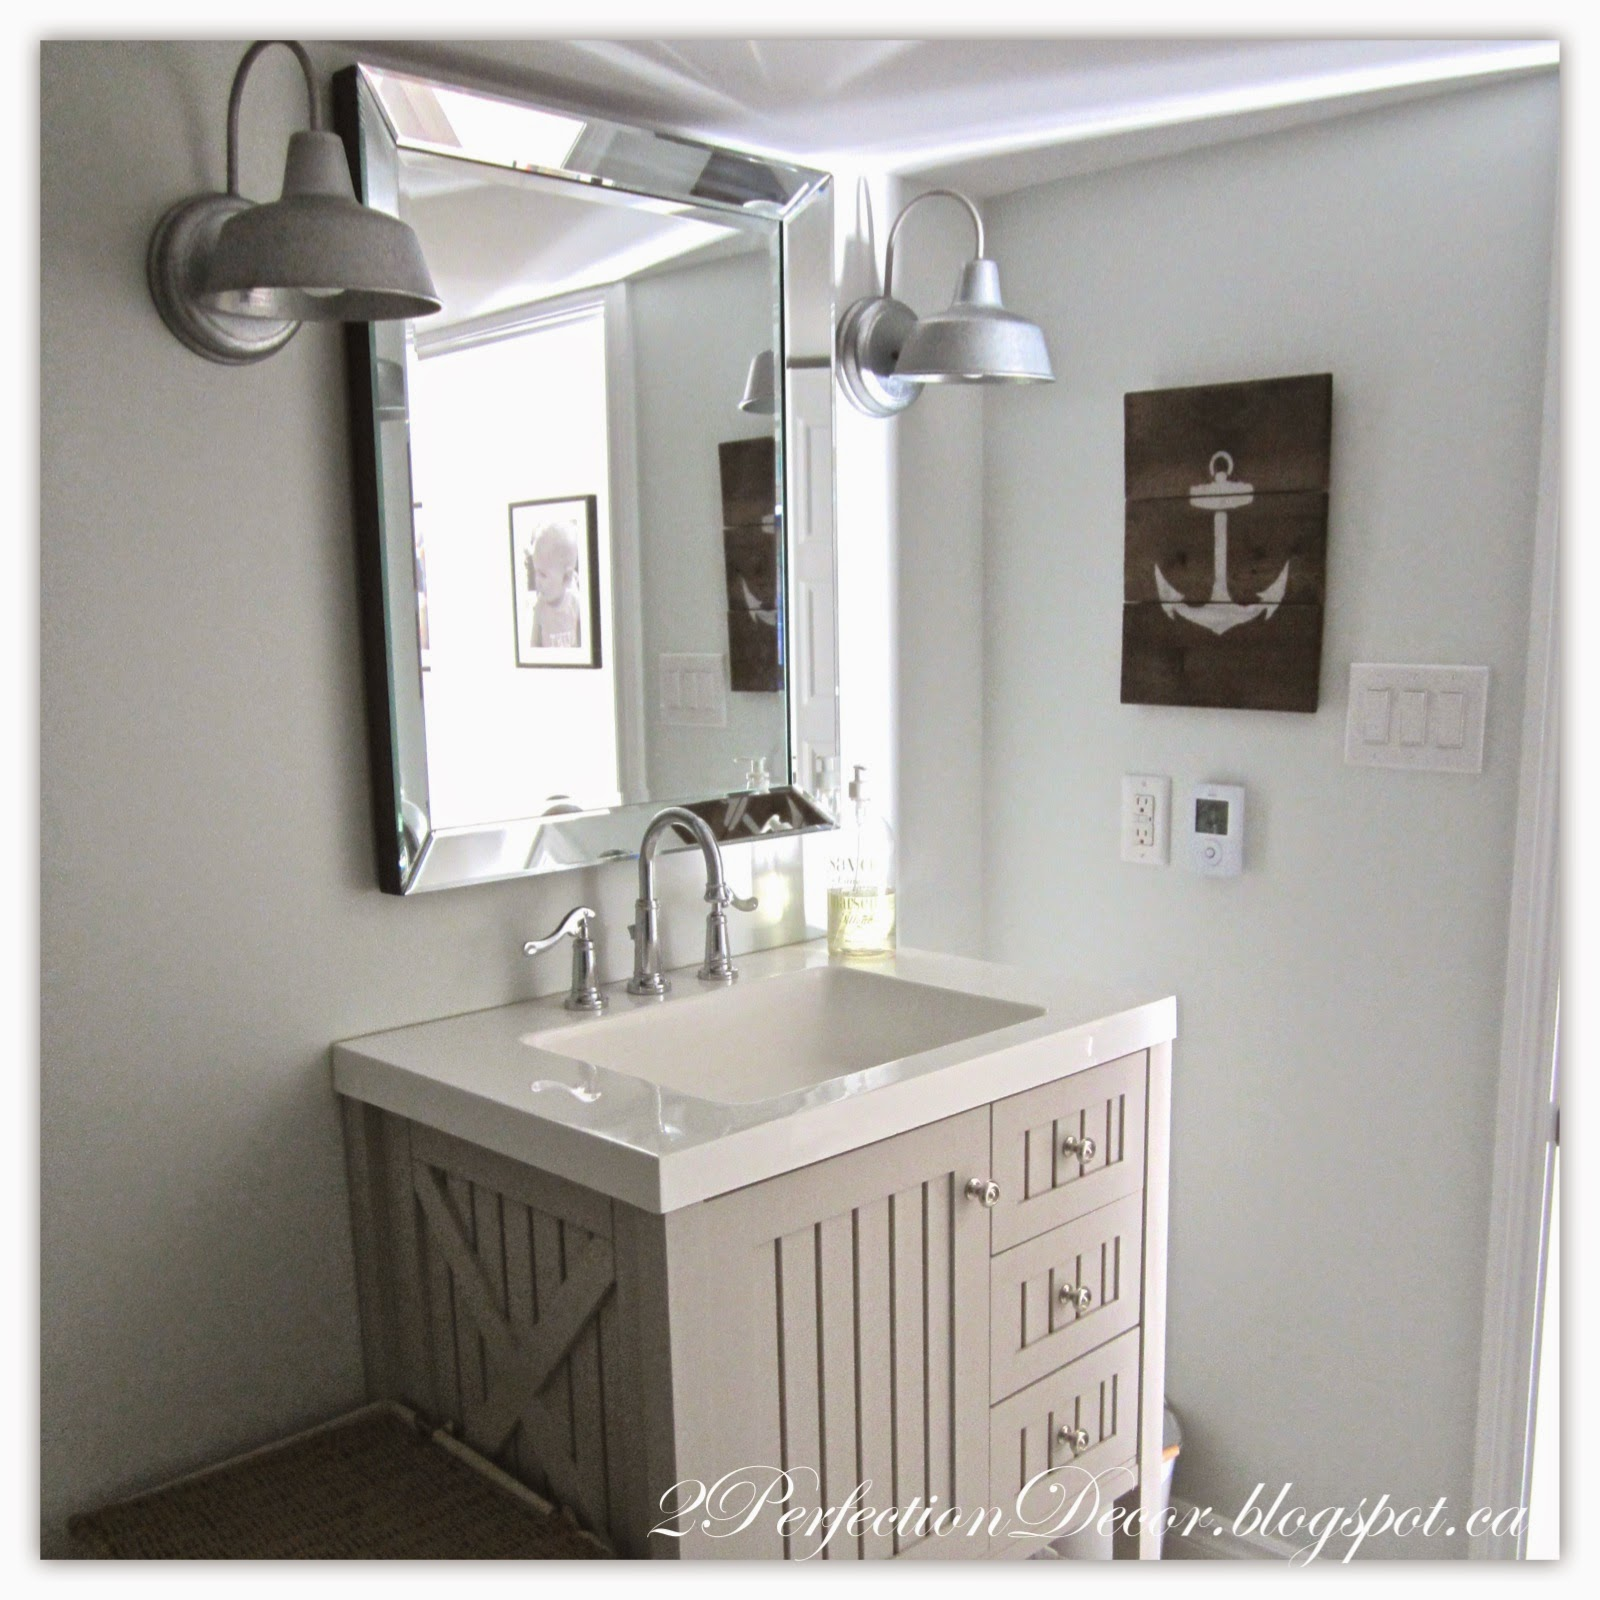 2Perfection Decor Basement Coastal Bathroom Reveal